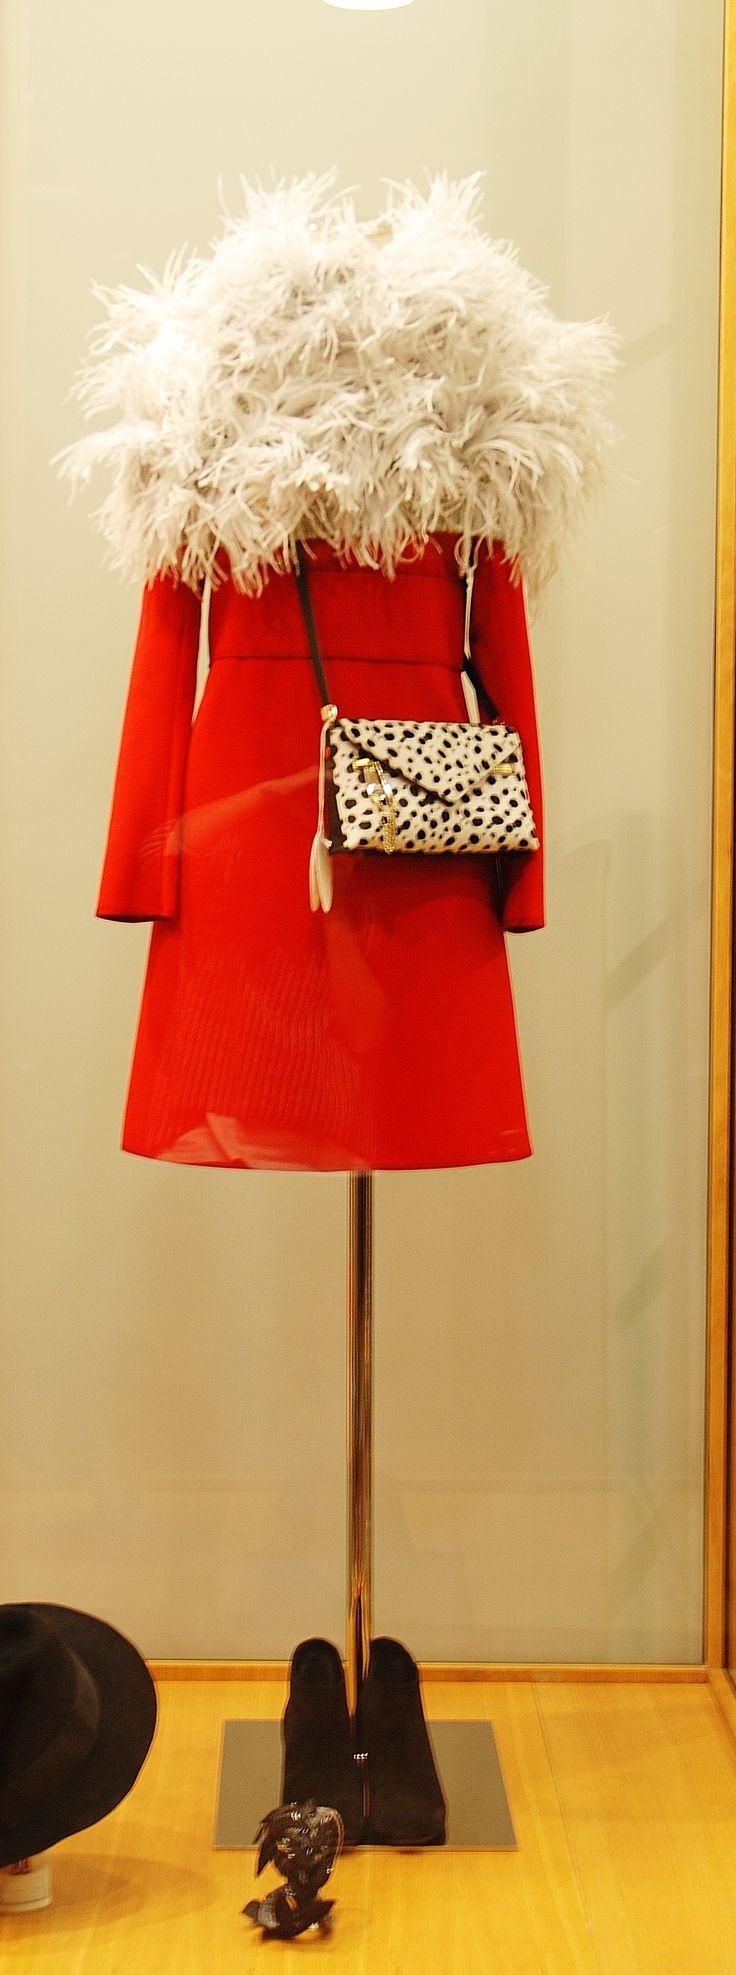 Dress + Pochette Chloé Shoes Golden Goose